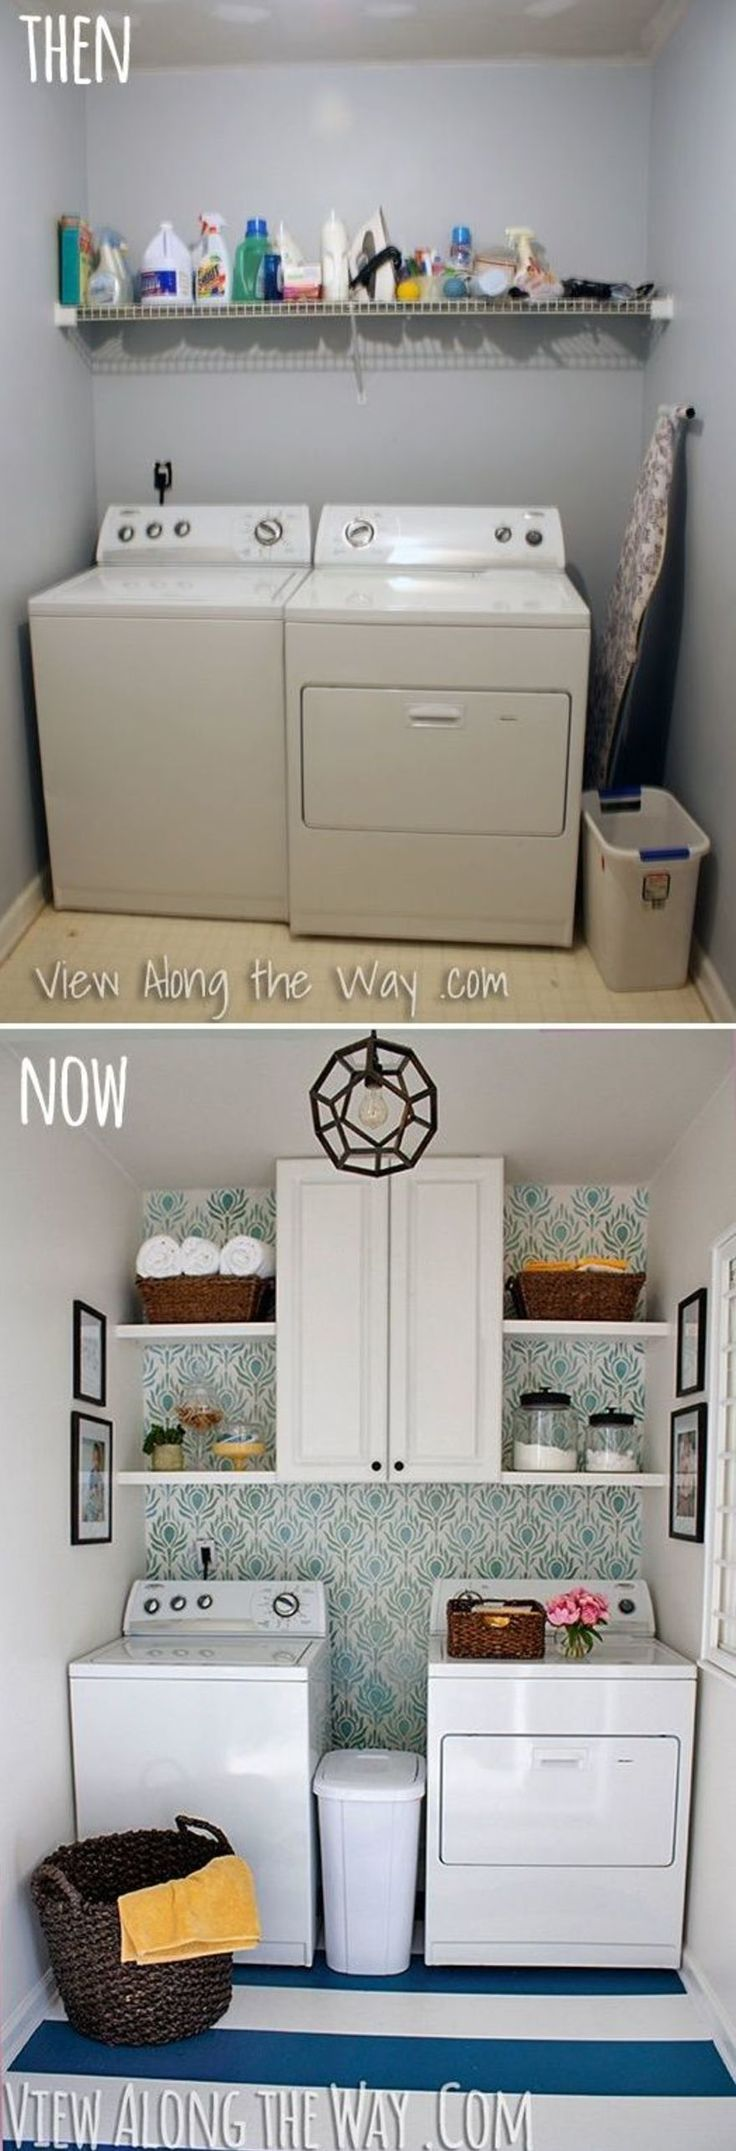 BASEMENT LAUNDRY ROOM: Unfinished Basement Laundry Room Ideas, Basement  Laundry Room Before And After